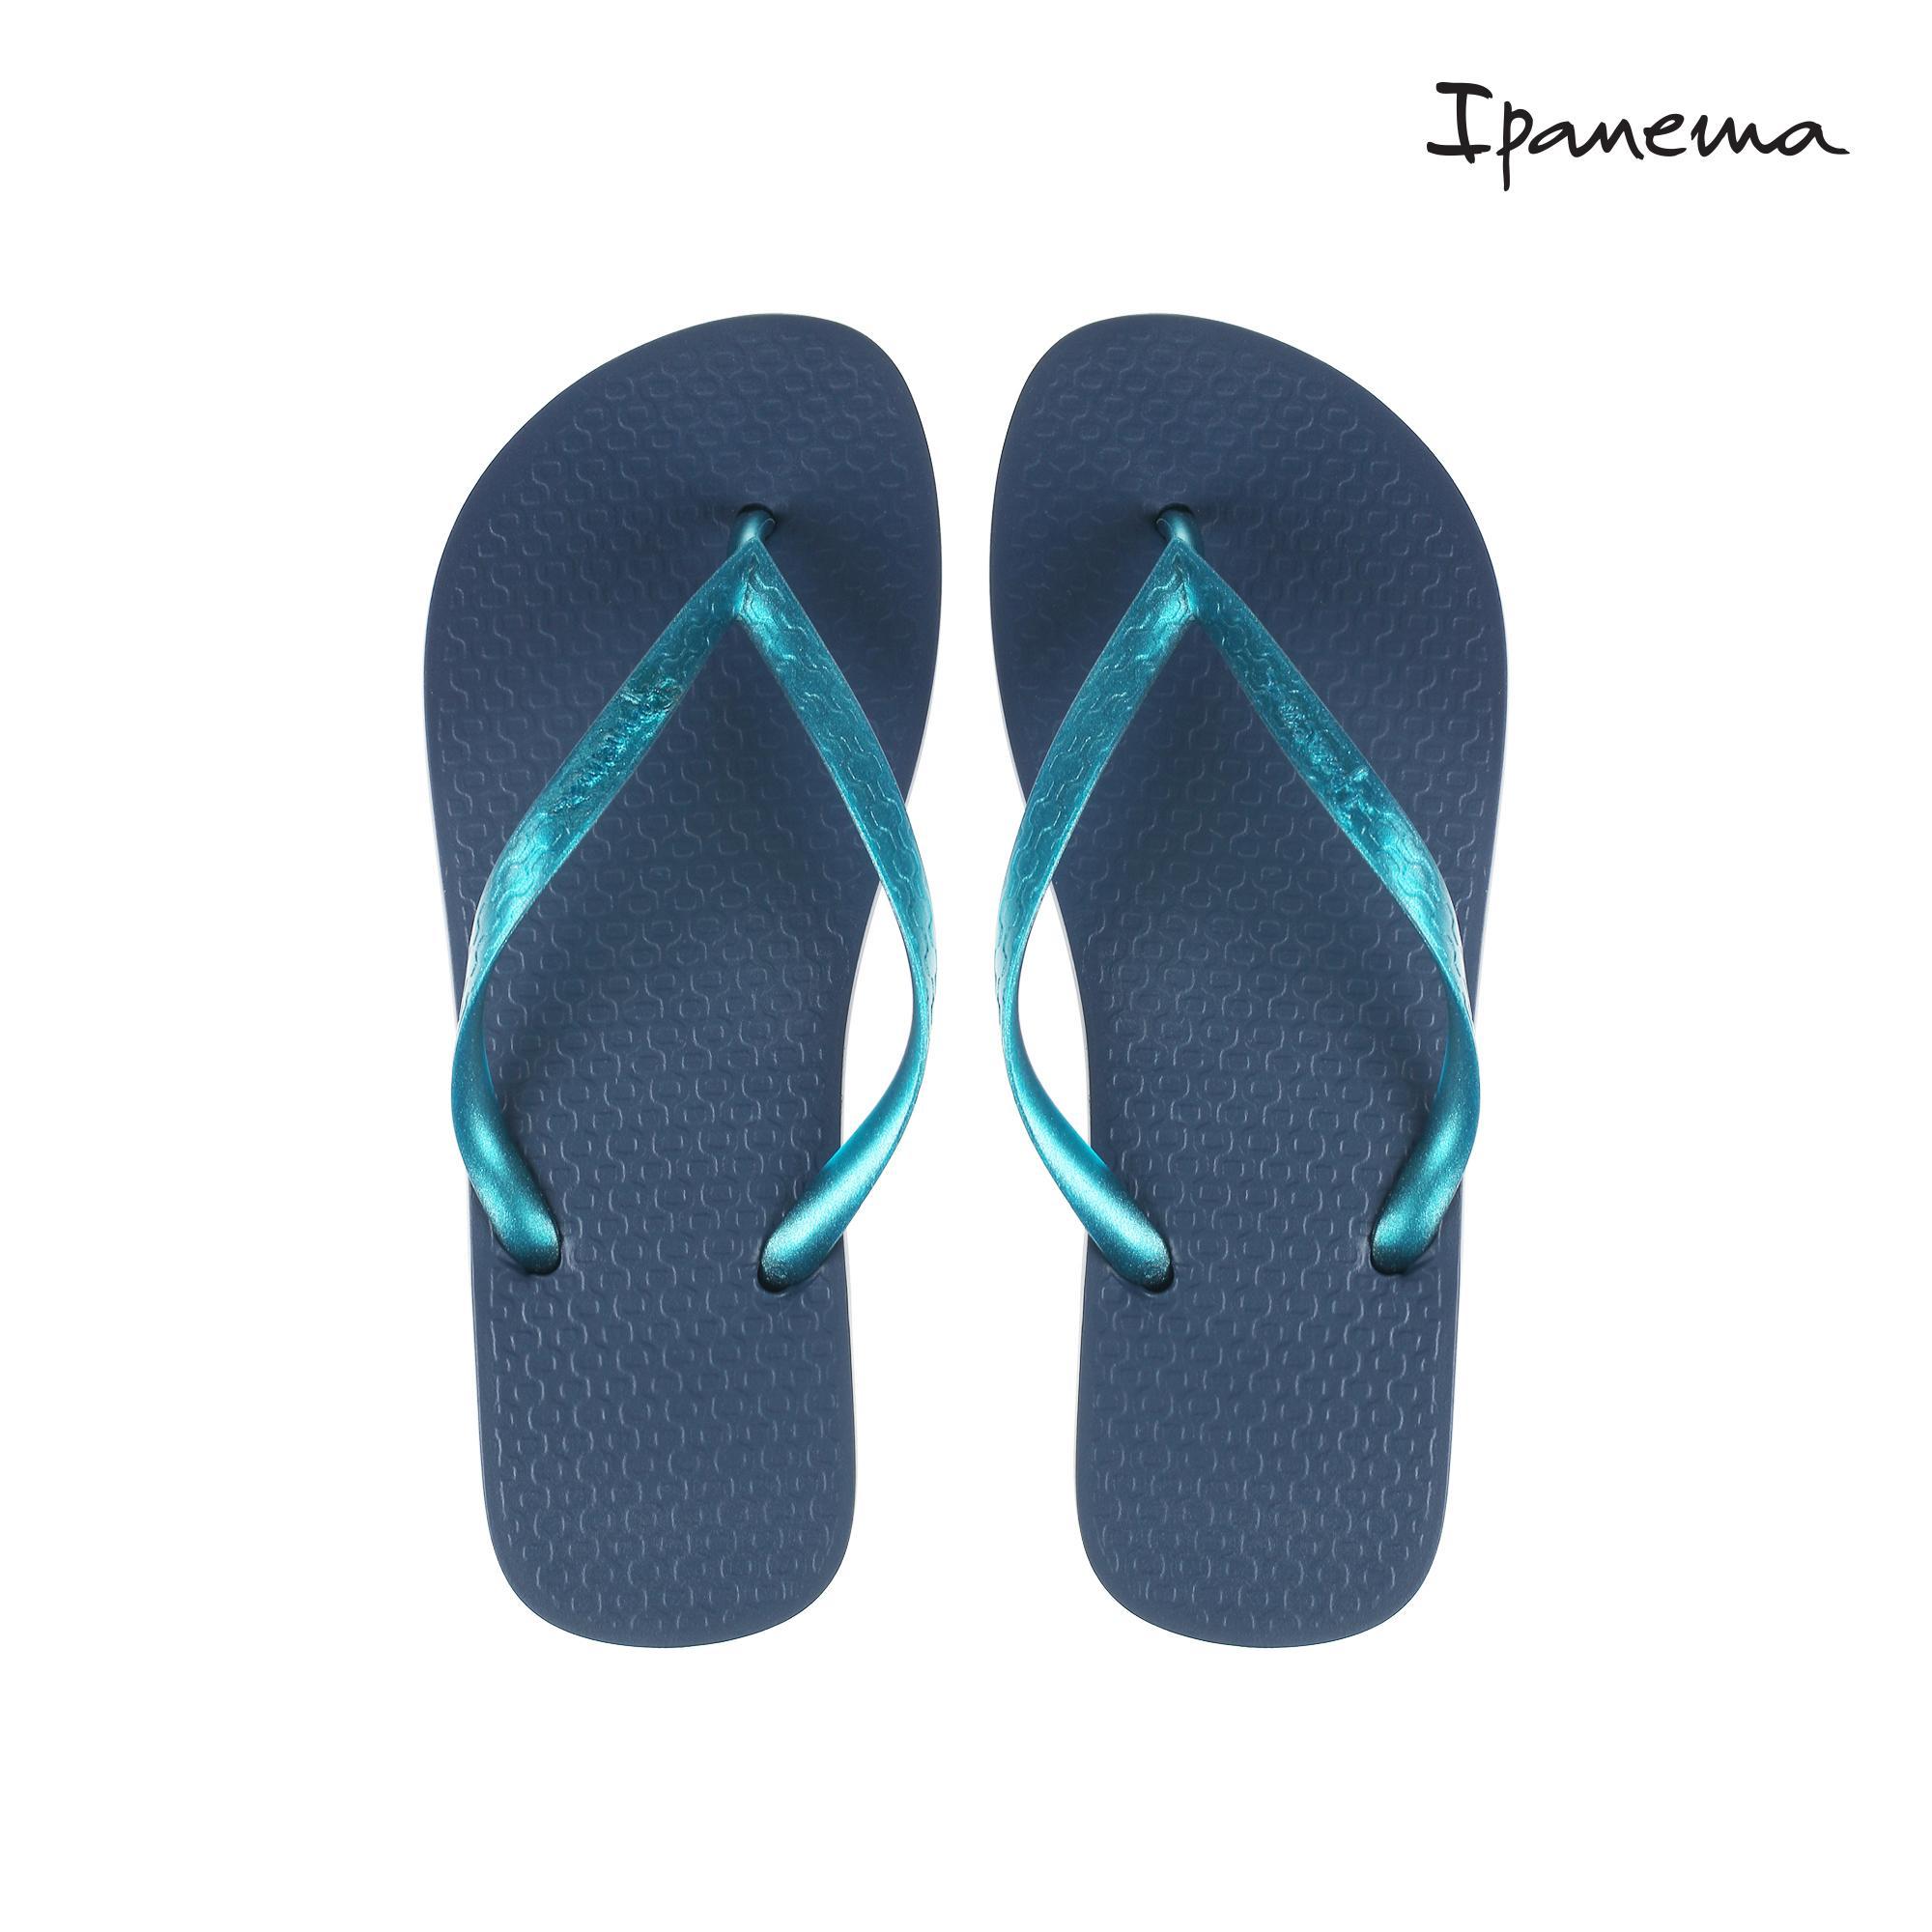 0437bab64 Ipanema Philippines  Ipanema price list - Ipanema Flip Flop ...